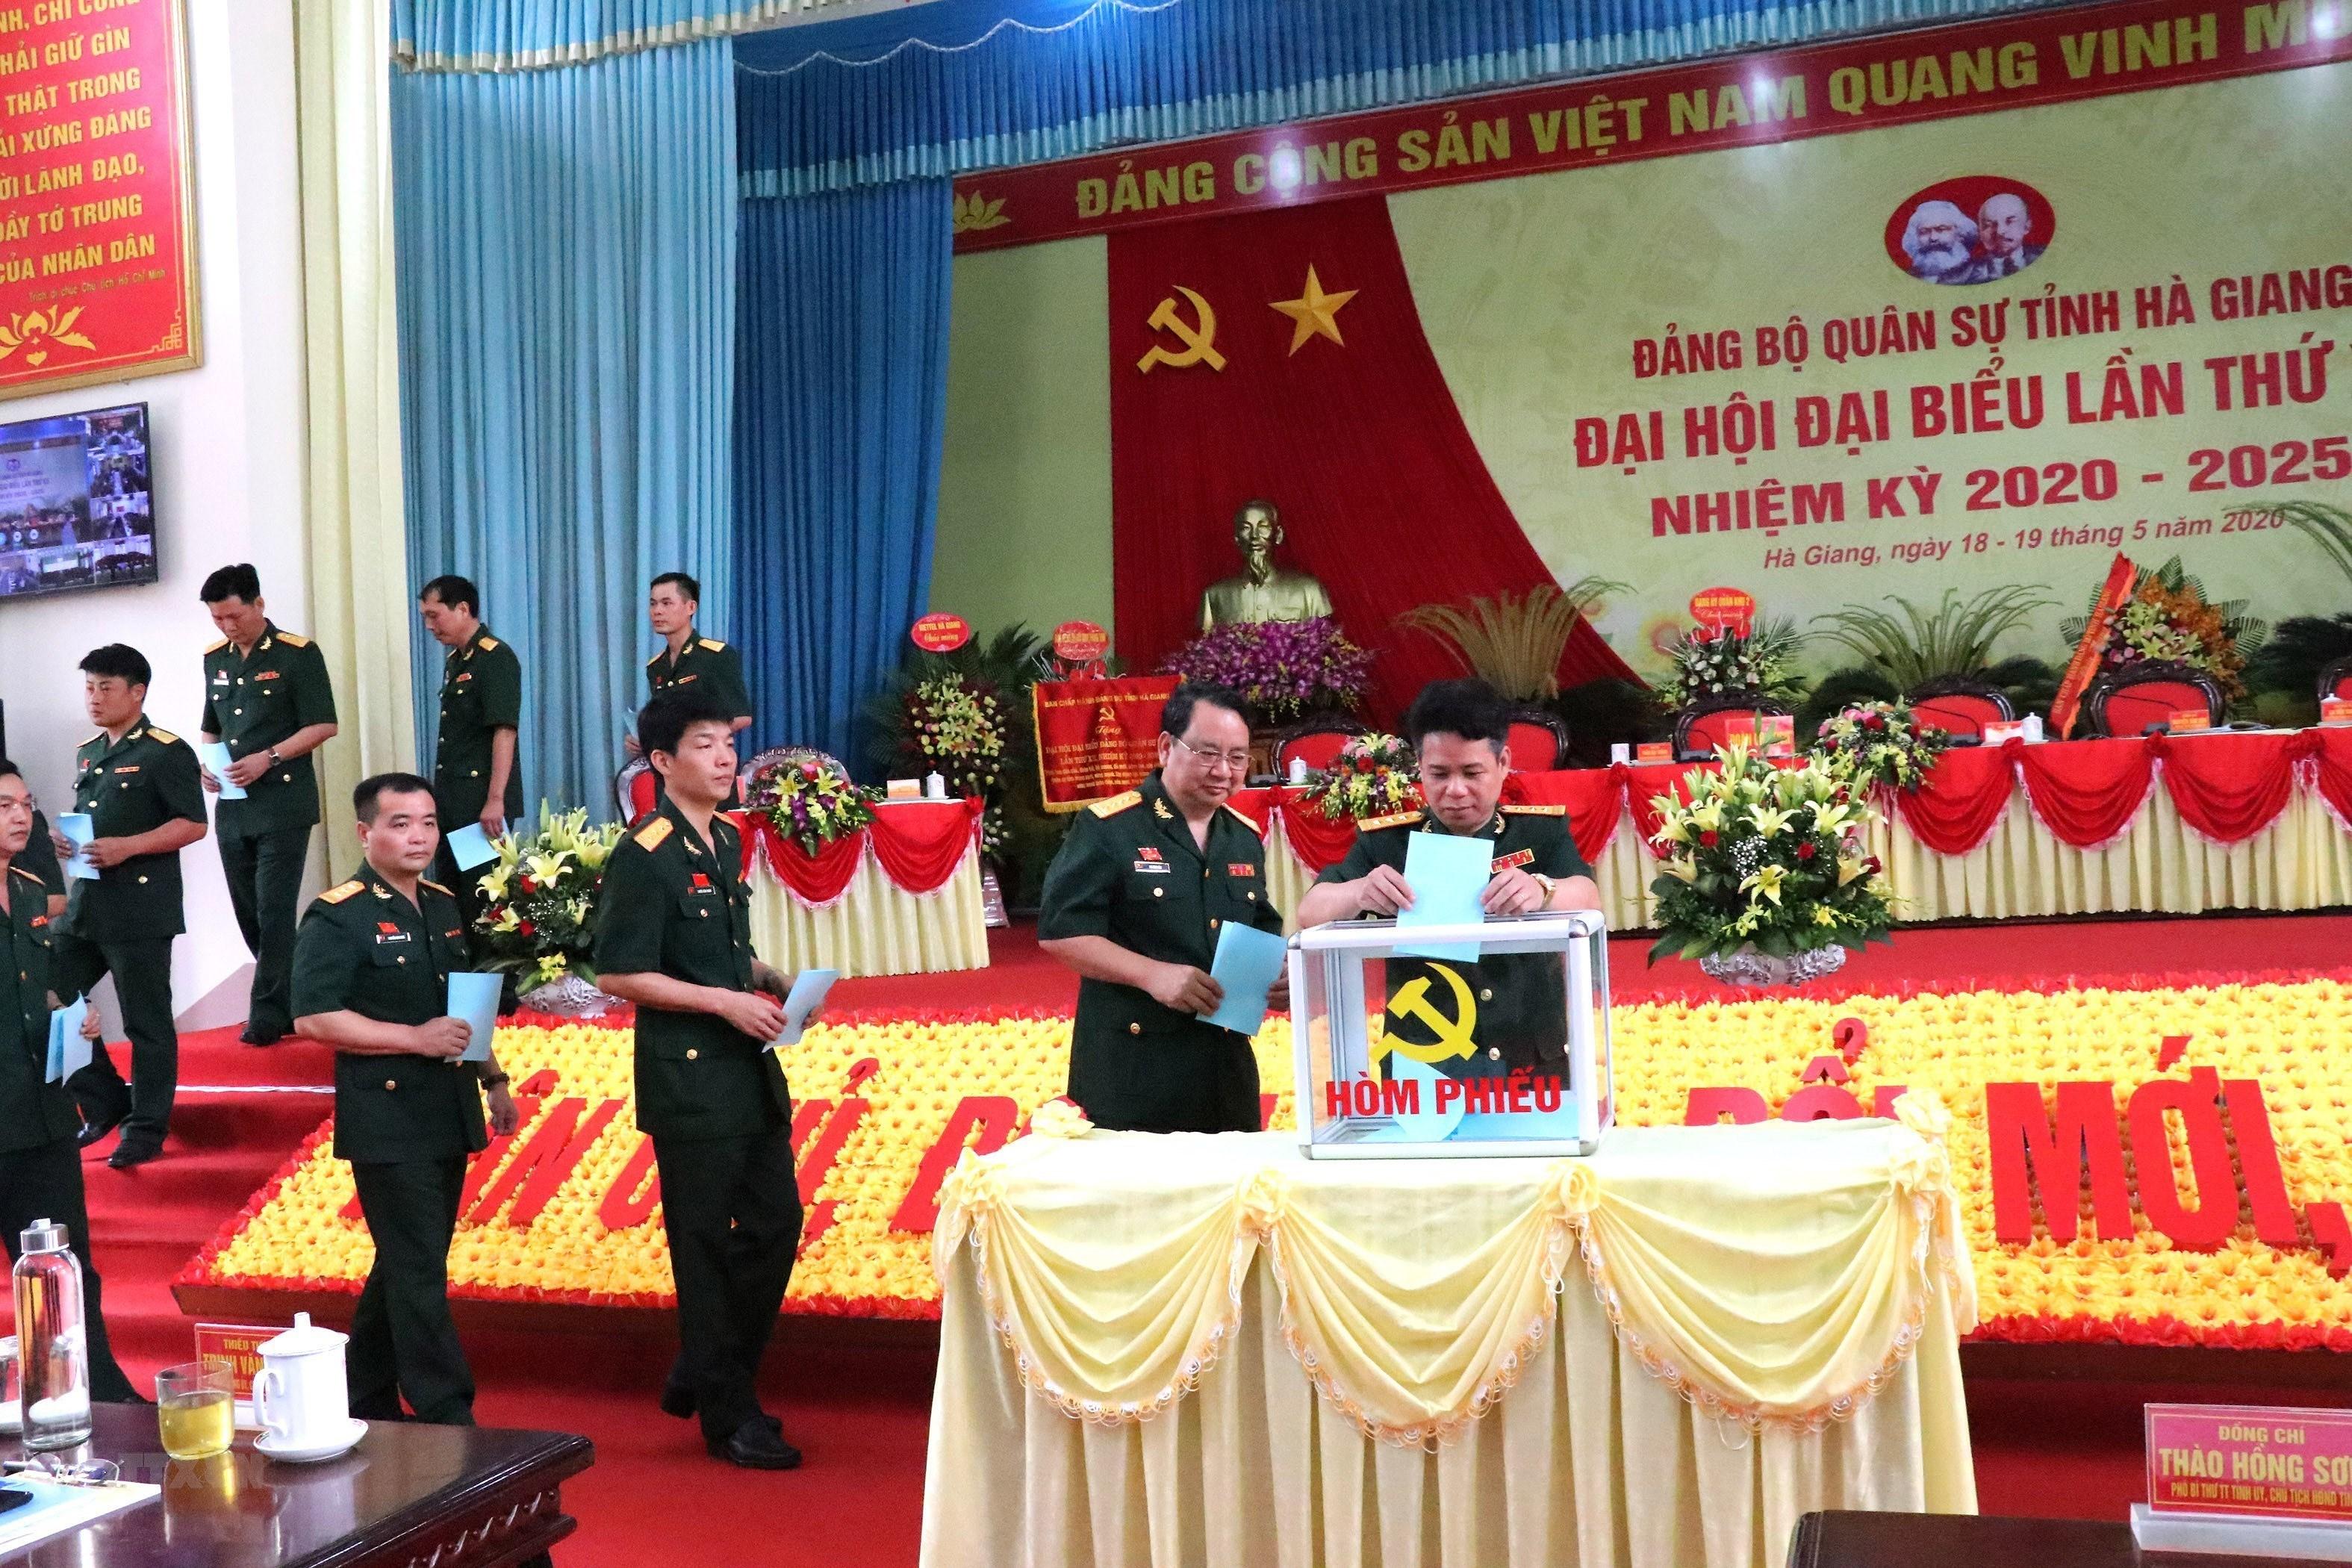 Dai hoi dai bieu Dang bo Quan su tinh Ha Giang nhiem ky 2020-2025 hinh anh 2